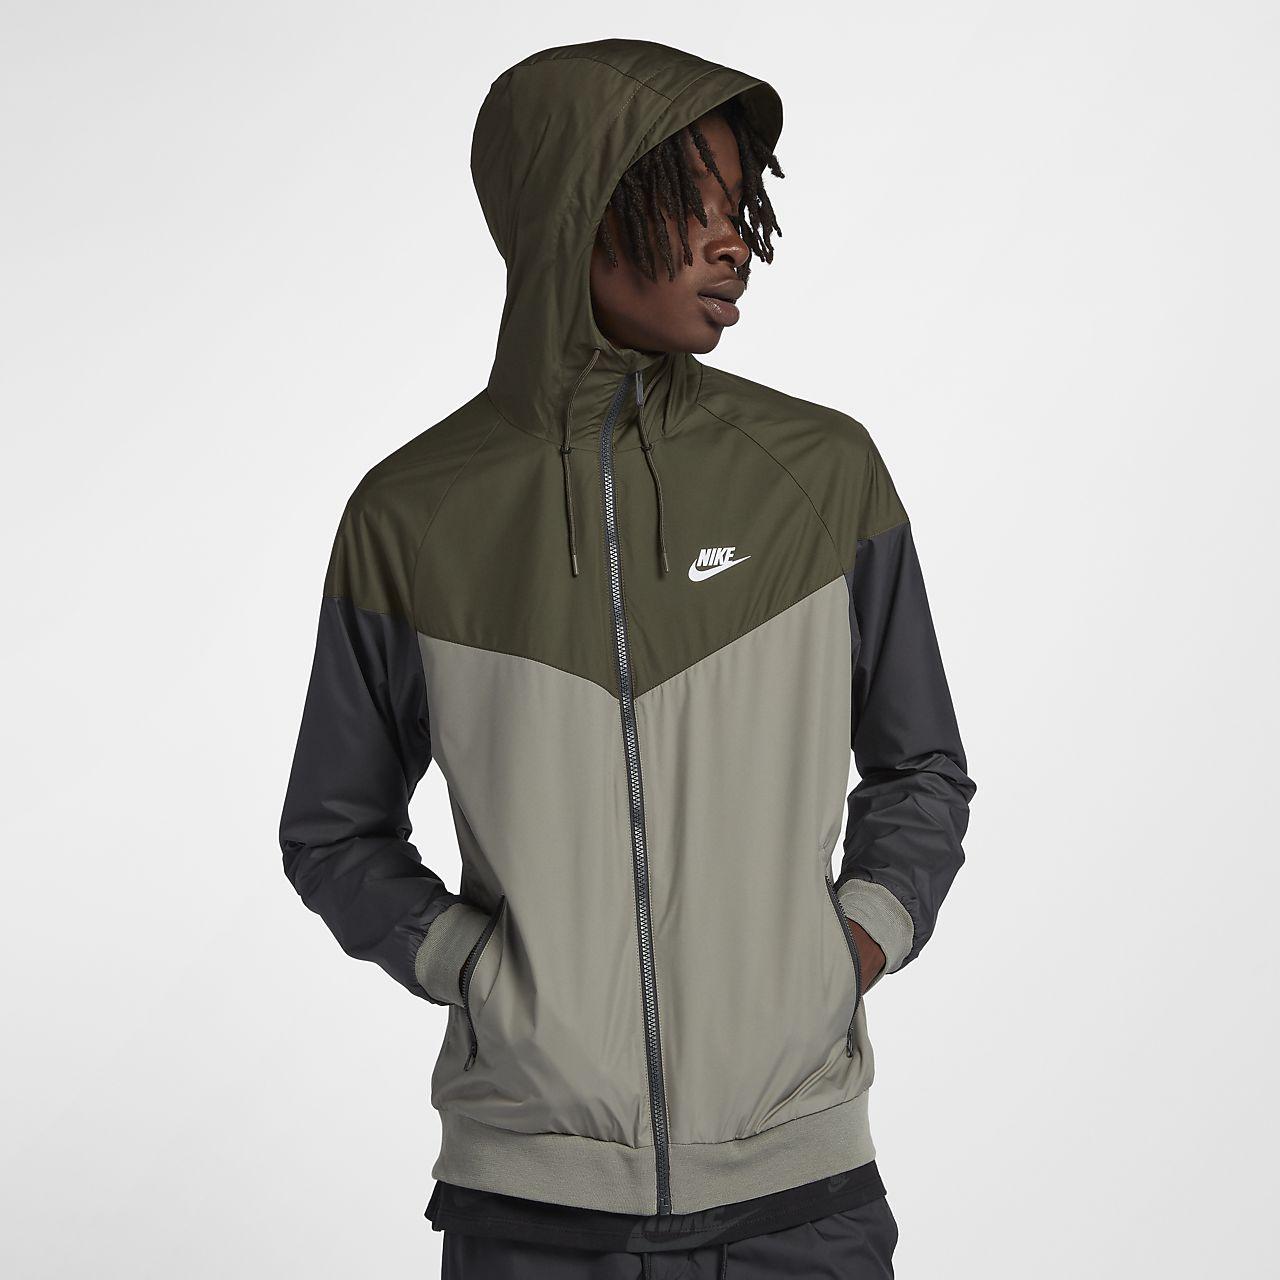 Nike Windbreakers: Models and Patterns 67